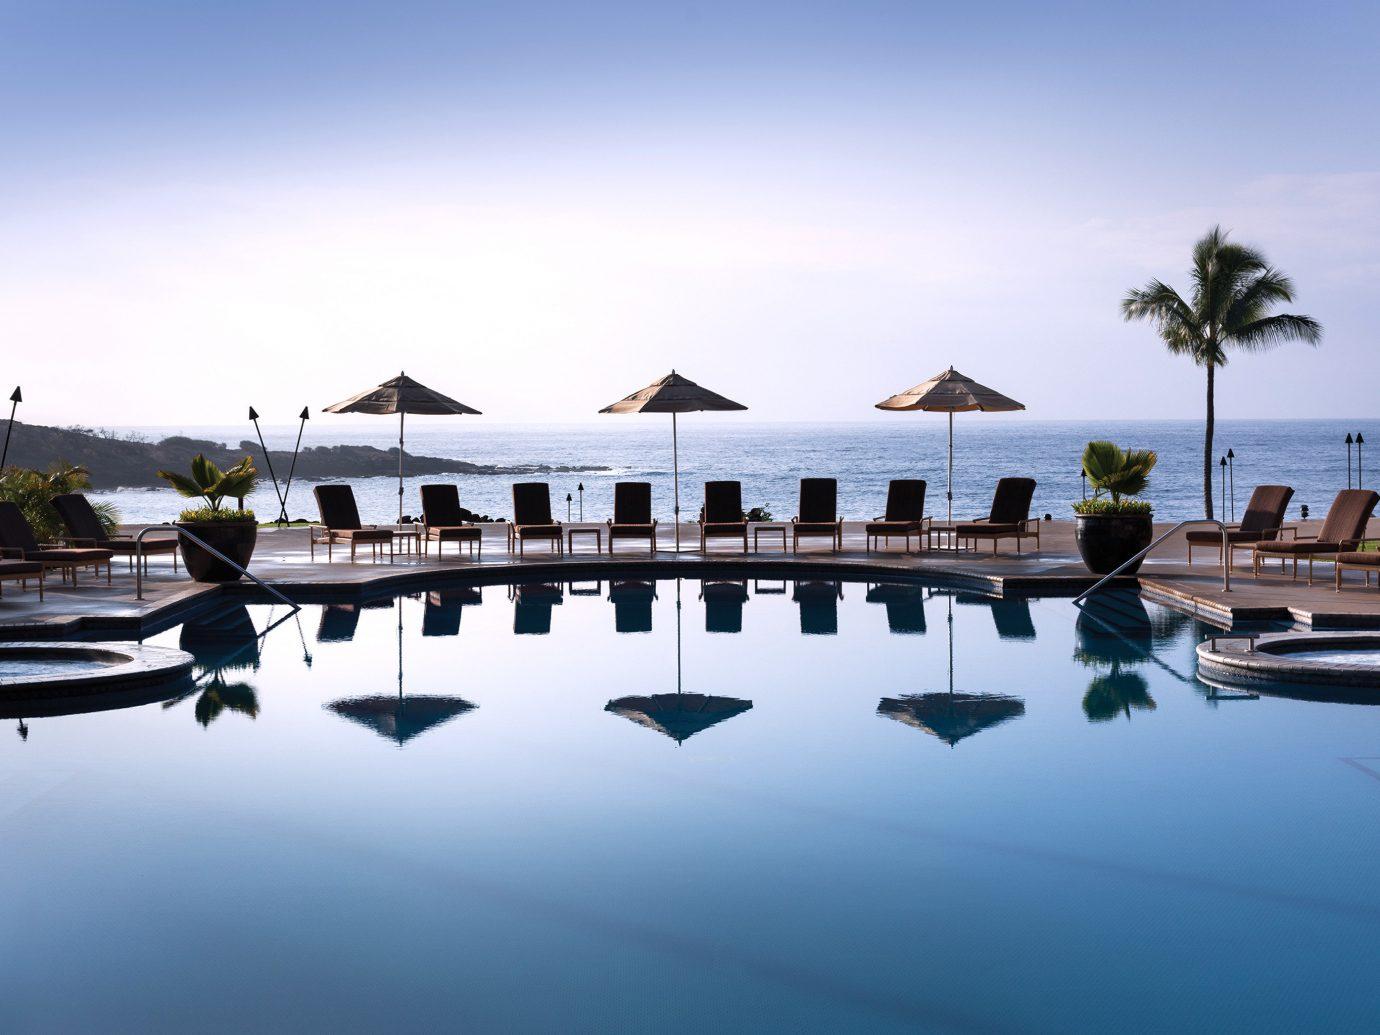 Beachfront Hotels Living Lounge Luxury Pool Romance Trip Ideas sky outdoor reflection marina water dock Resort vacation estate Sea swimming pool bay dusk Lake day